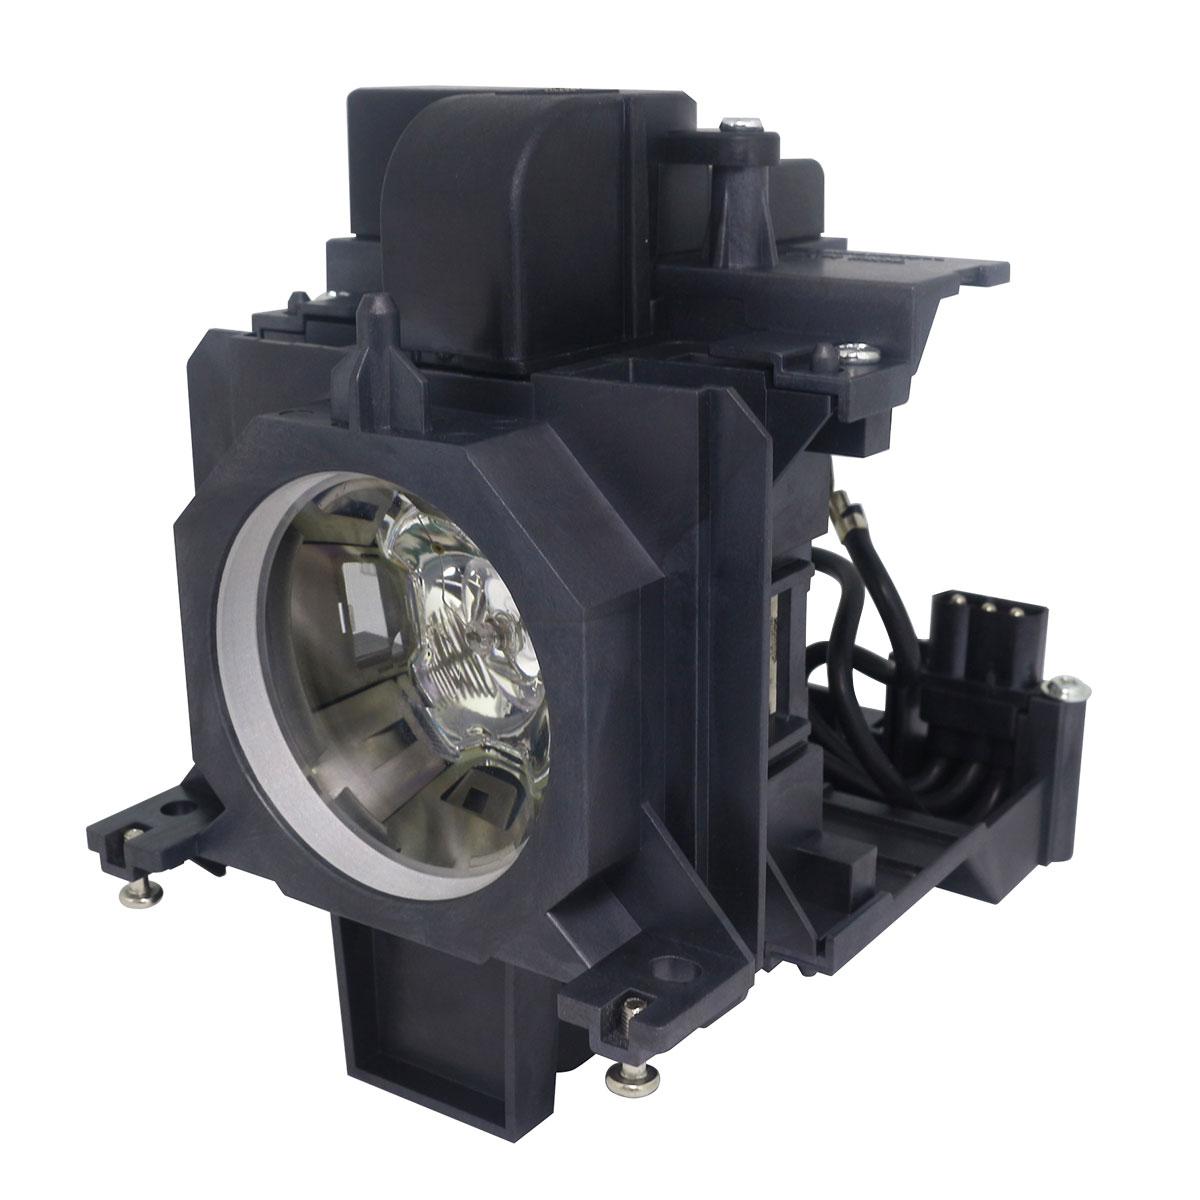 Eiki POA-LMP137 FP Lamp